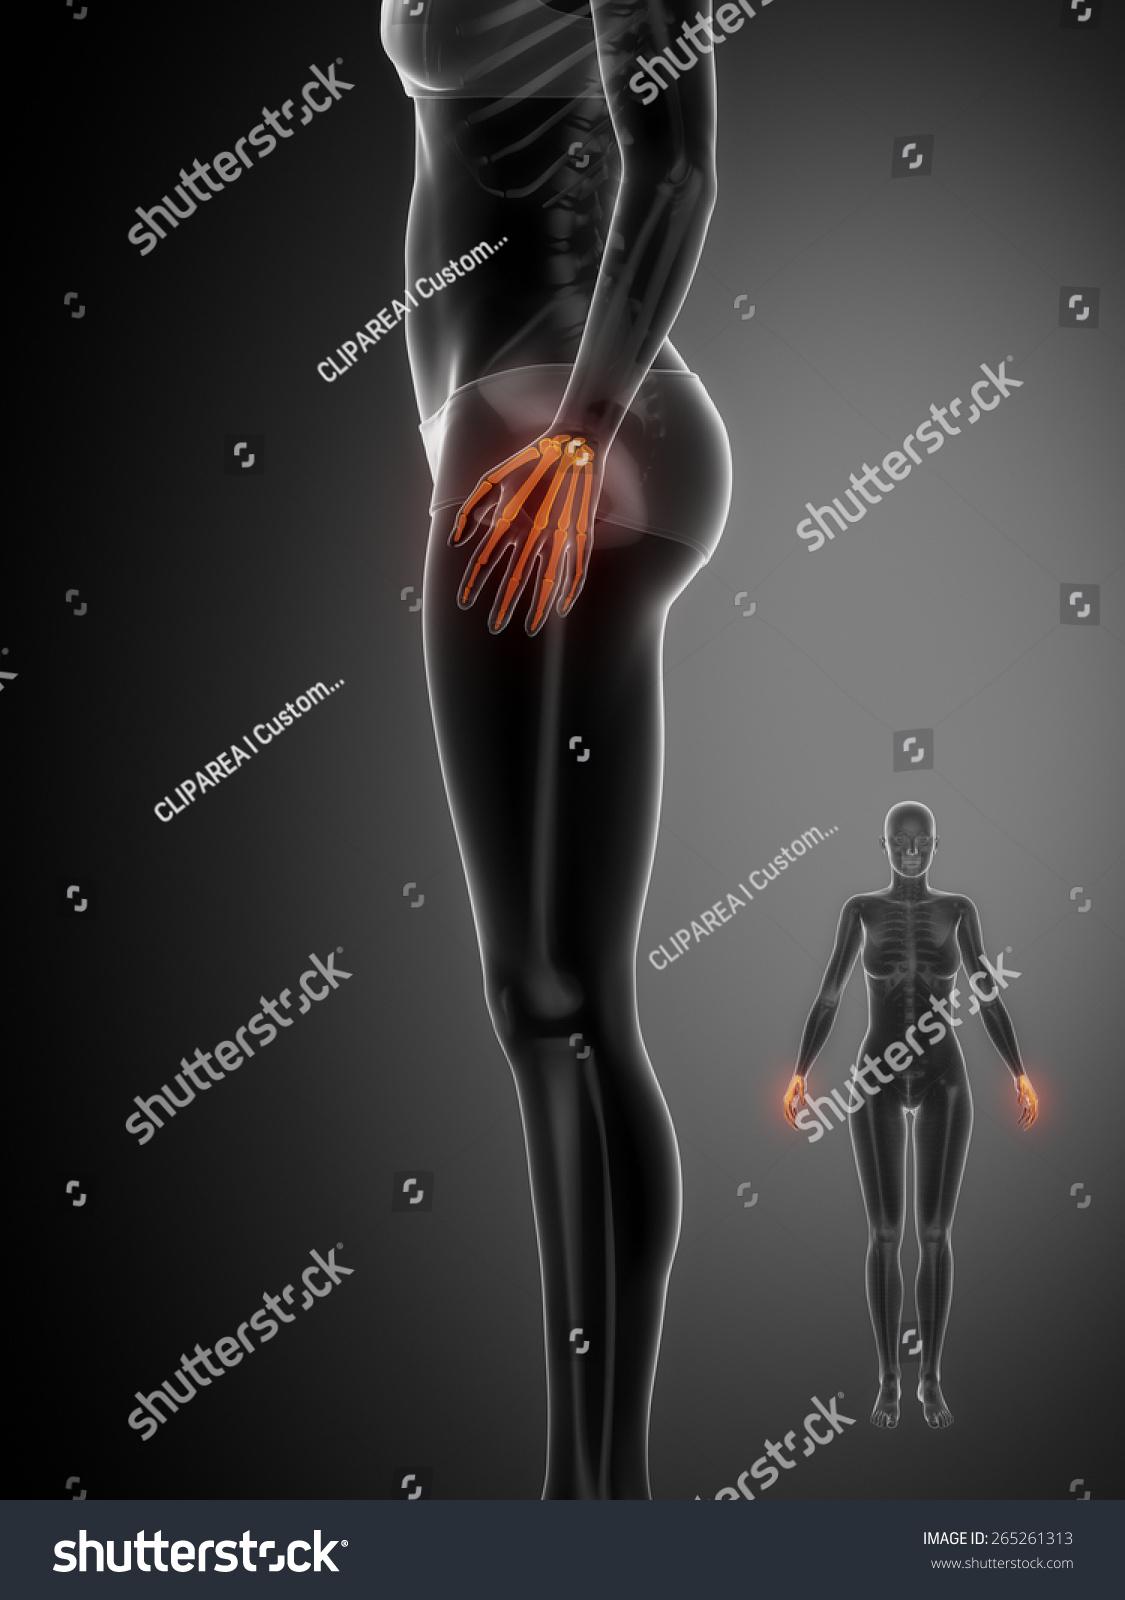 Wrist Bone Anatomy Xray Scan Stock Illustration 265261313 Shutterstock